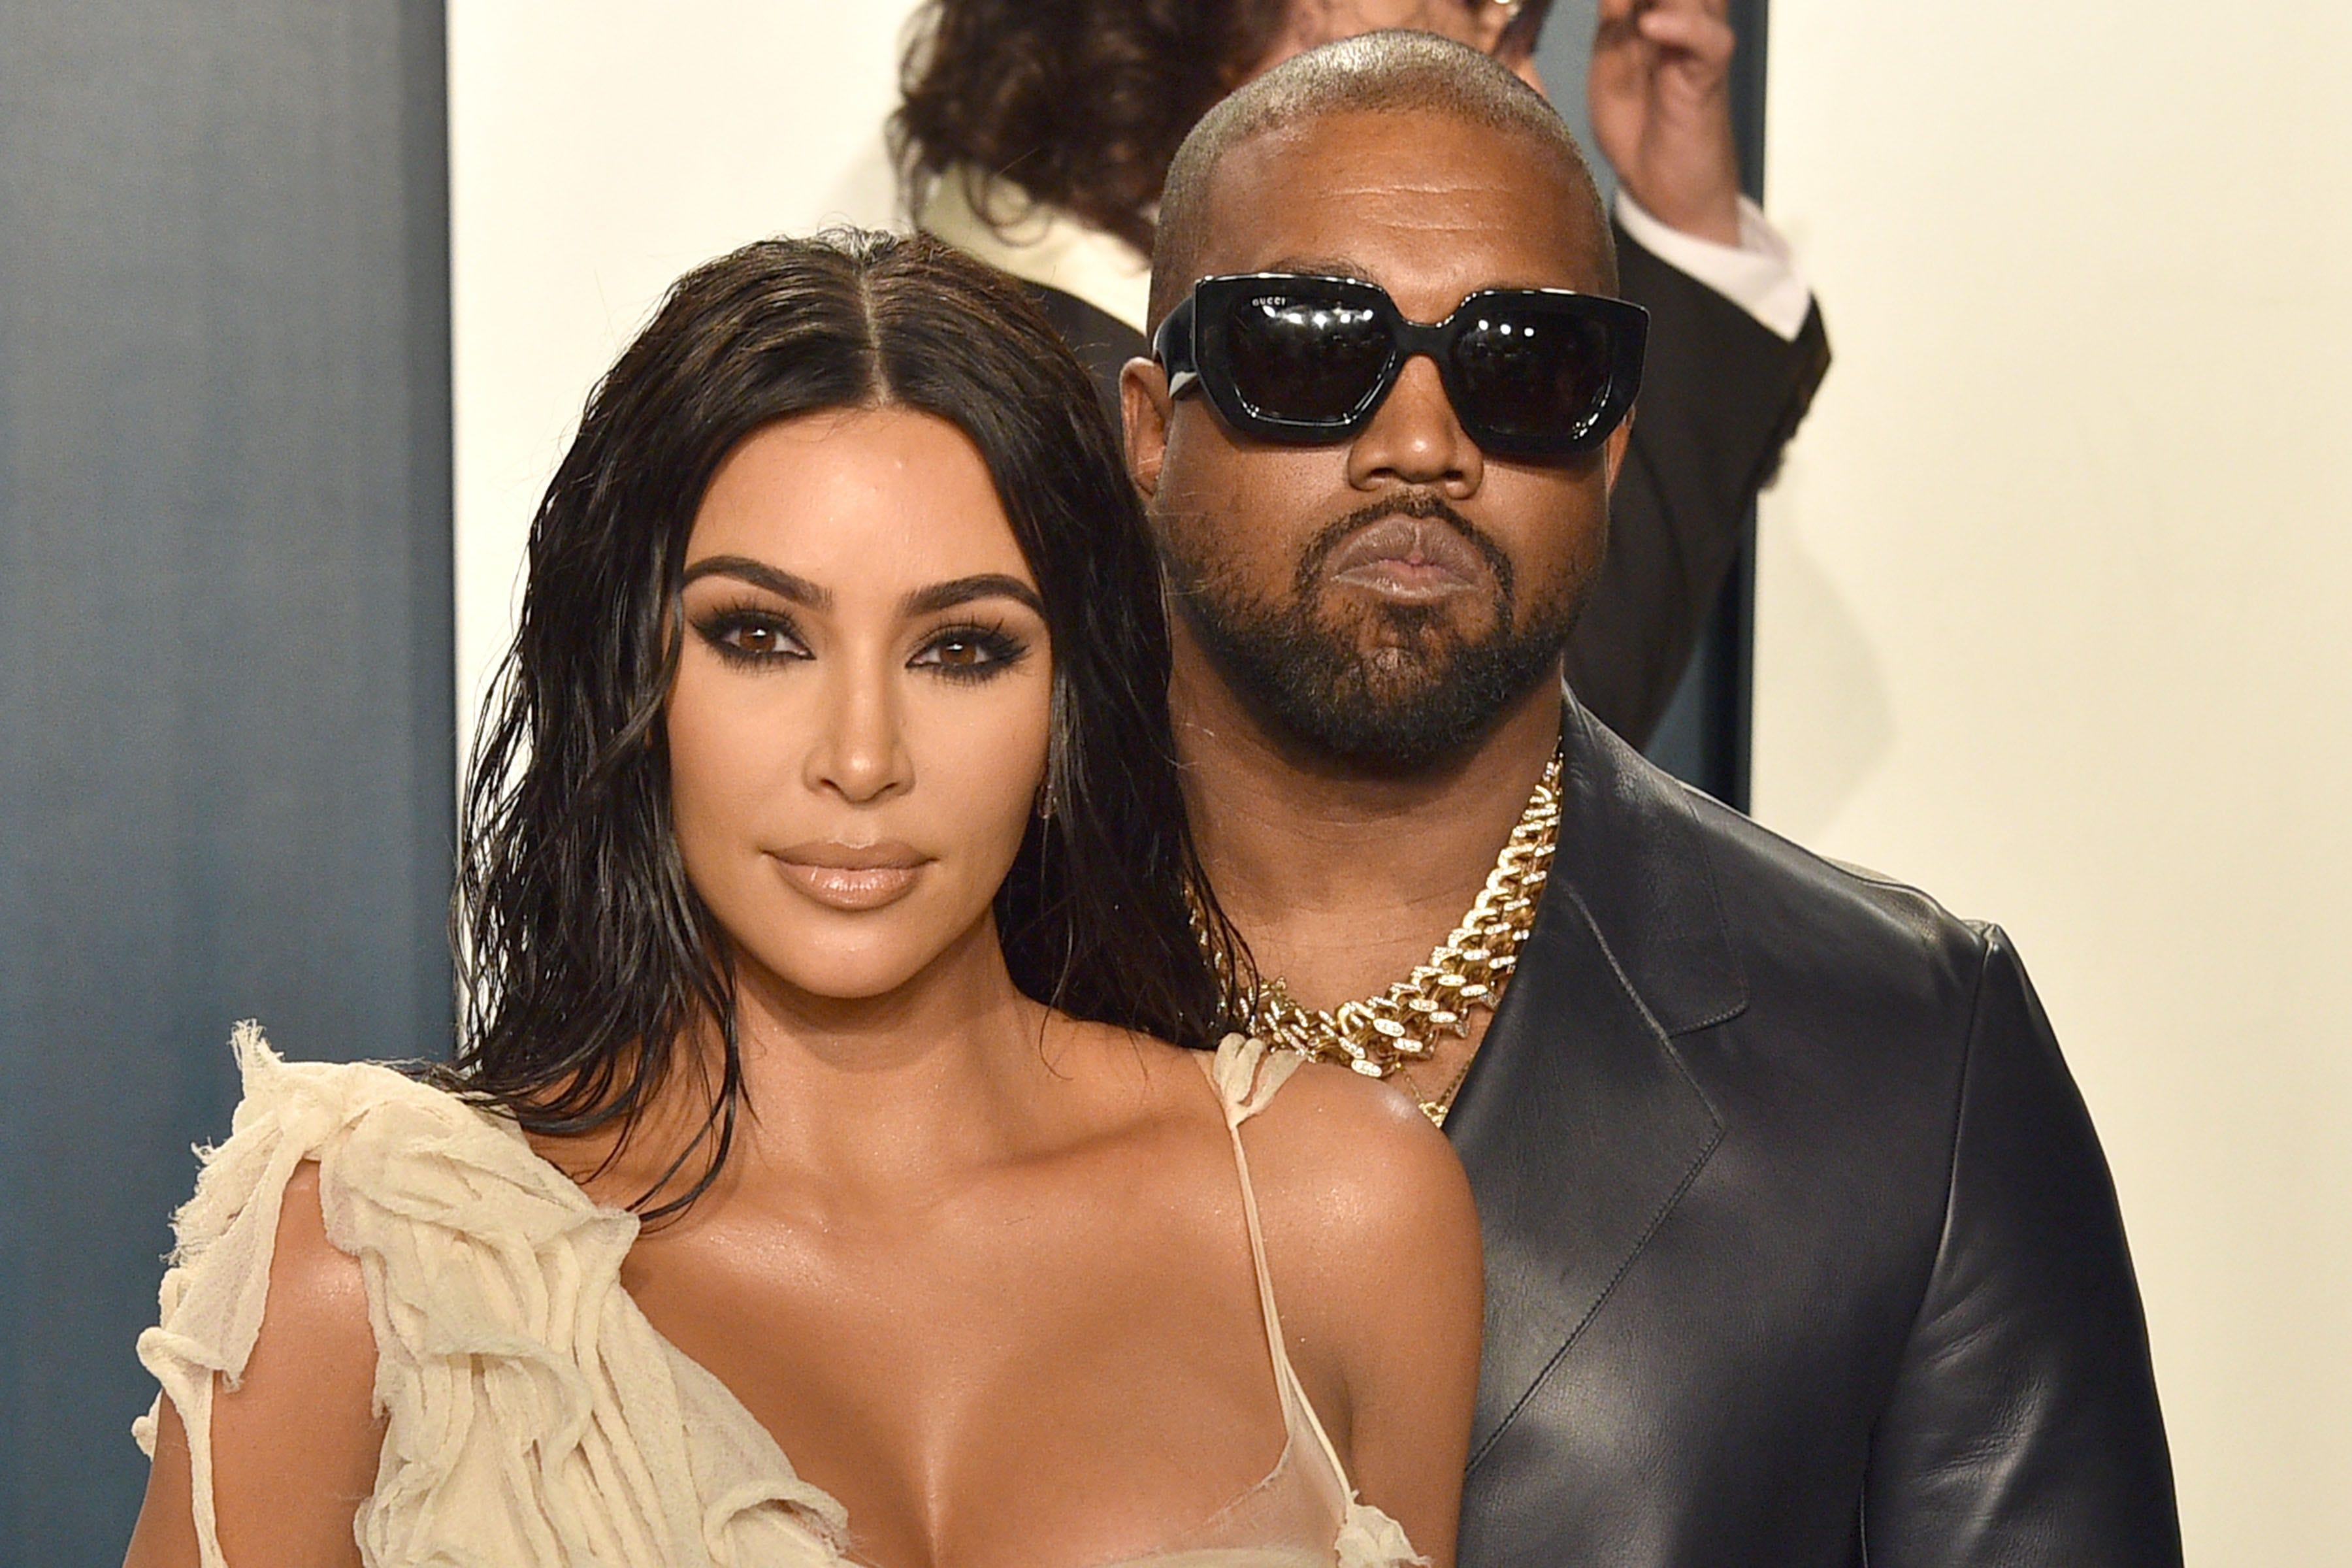 Kanye West gifts Kim Kardashian a hologram of her late father Robert Kardashian for her 40th birthday – Fox News